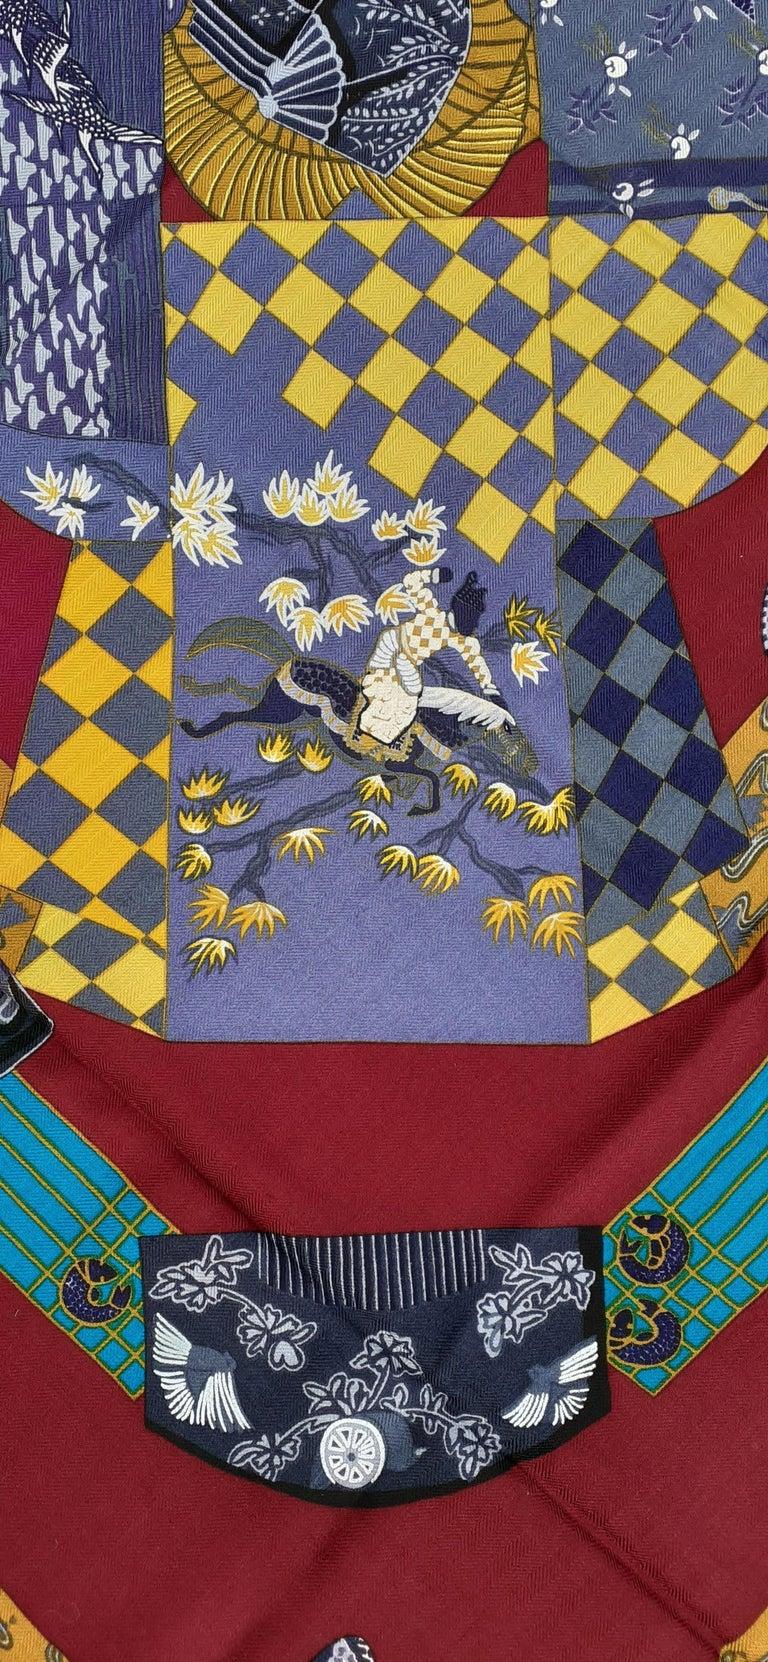 Hermès Shawl Scarf Kimonos et Inros Annie Faivre Cashmere Silk 54 inches For Sale 7